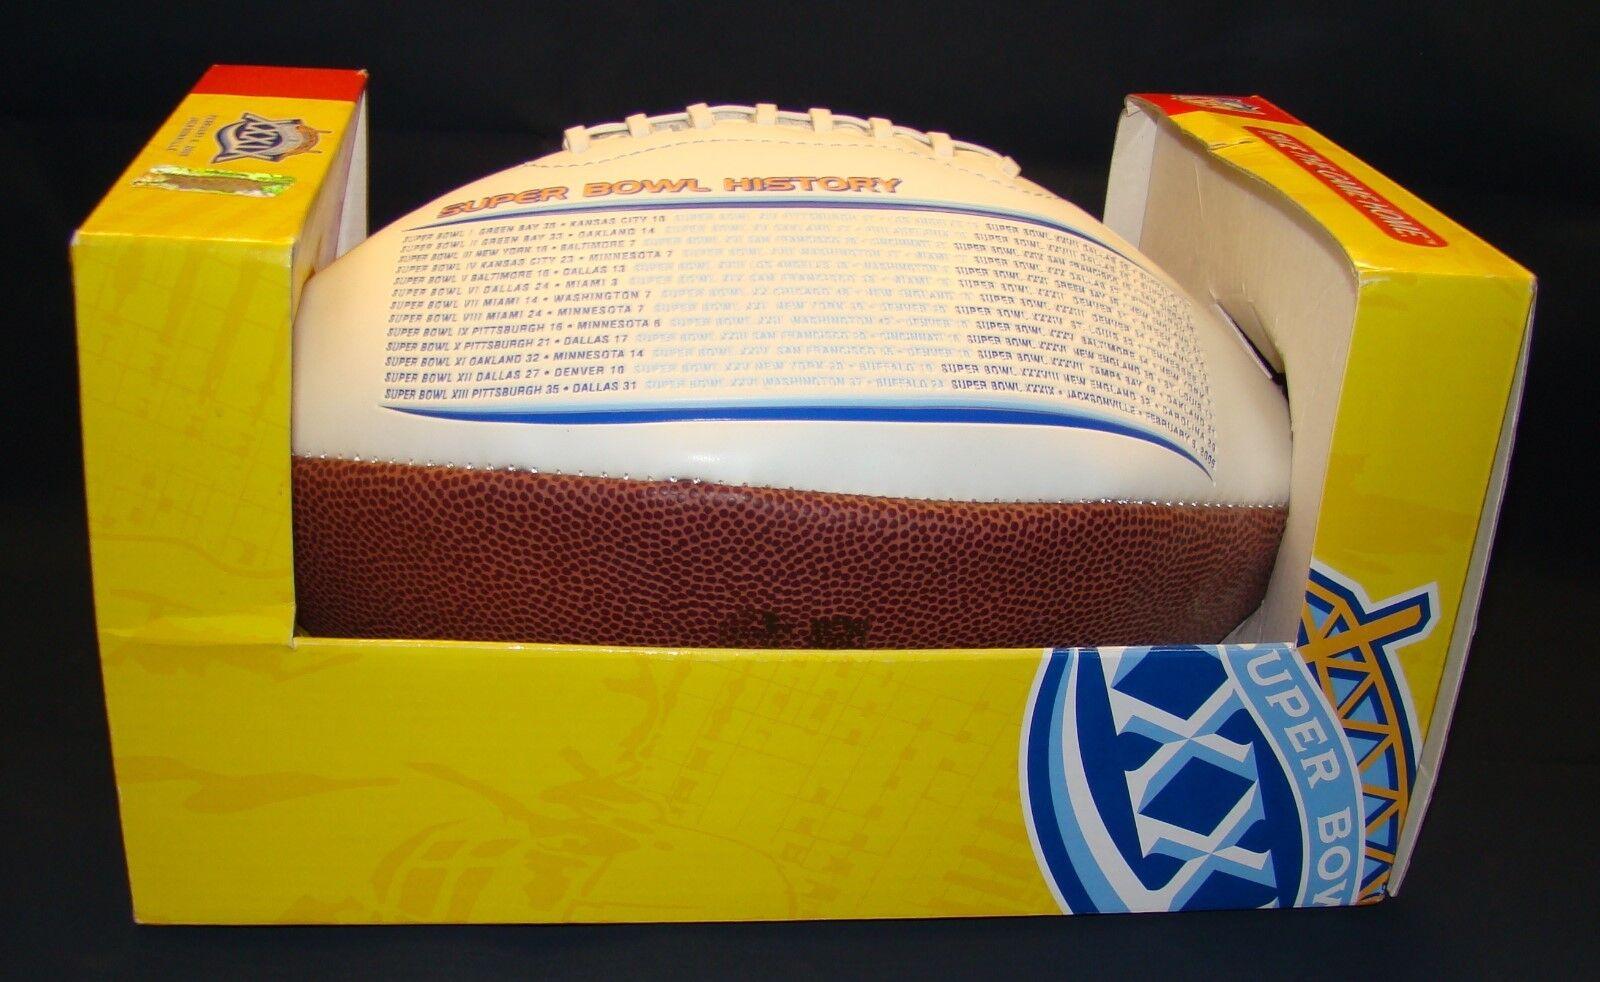 2005 NFL Limited Edition Commemorative Football Football Football SUPER BOWL XXXIX Ball NEW bb7404